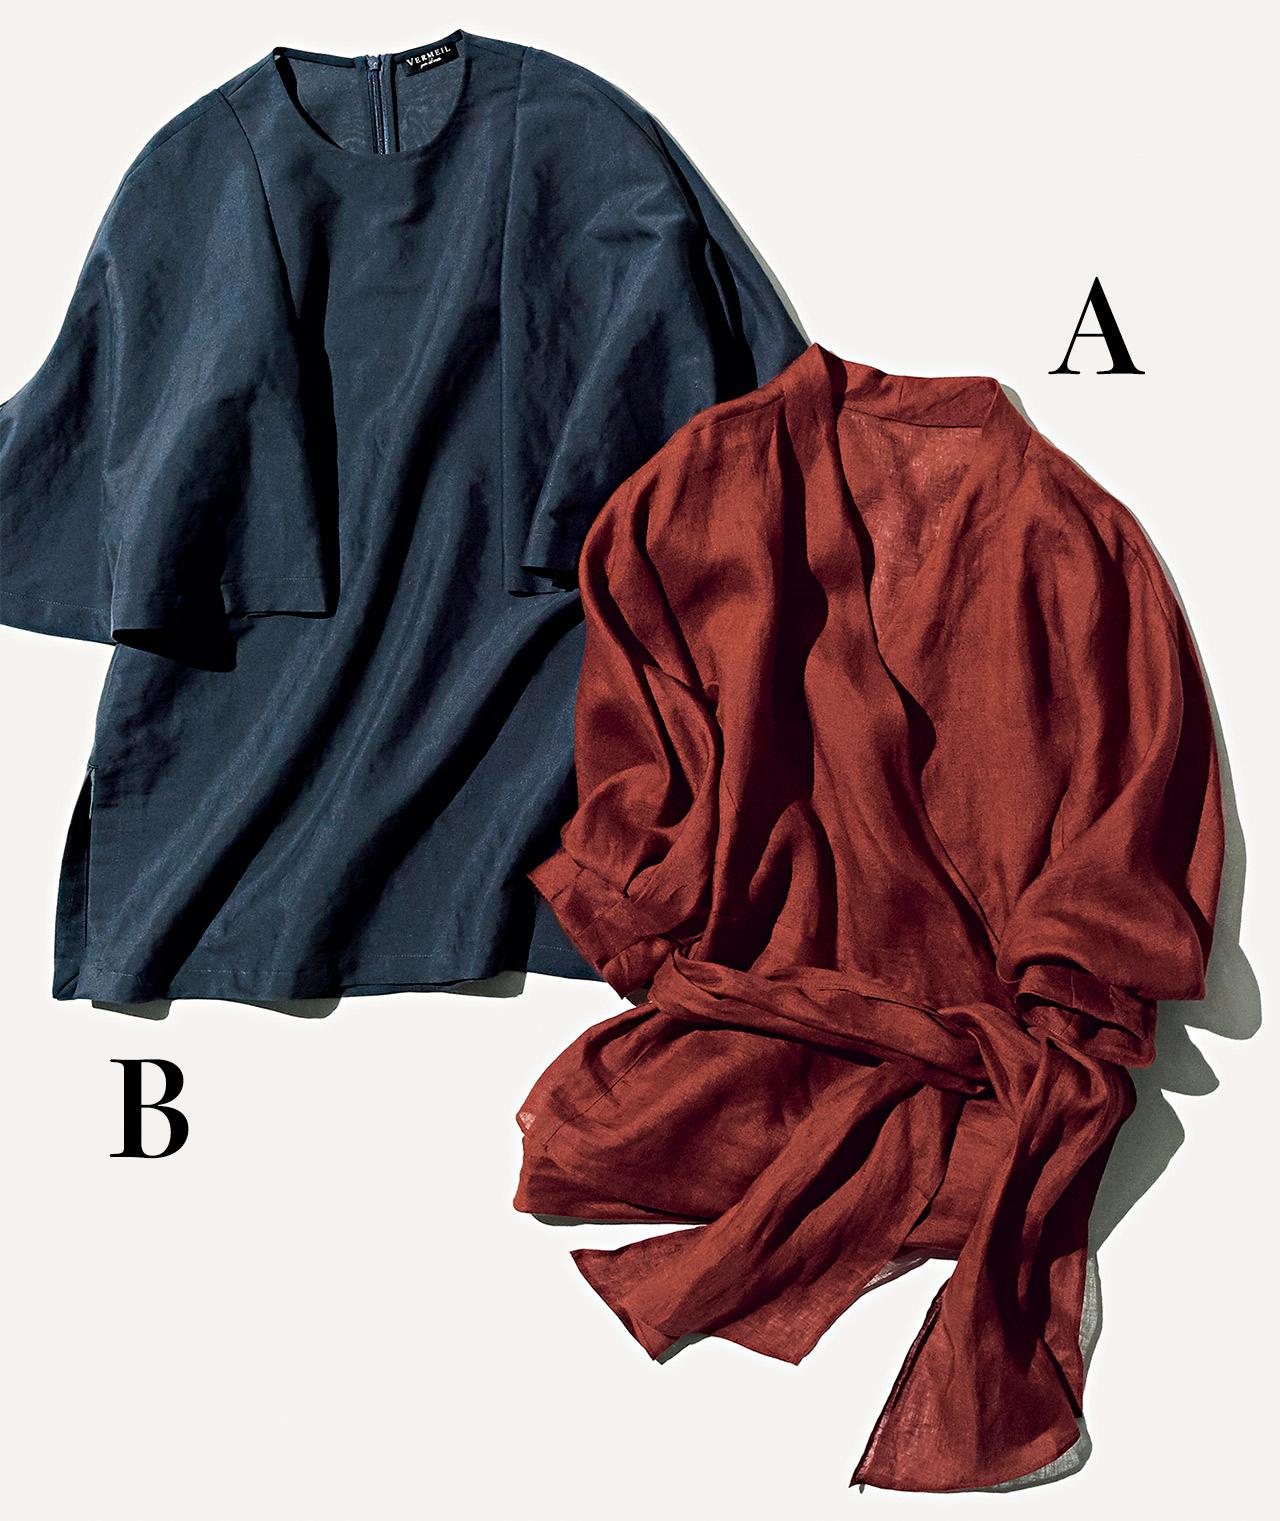 A:ヴェルメイユ パー イエナのカシュクールブラウス B:ヴェルメイユ パー イエナのケープ風ブラウス